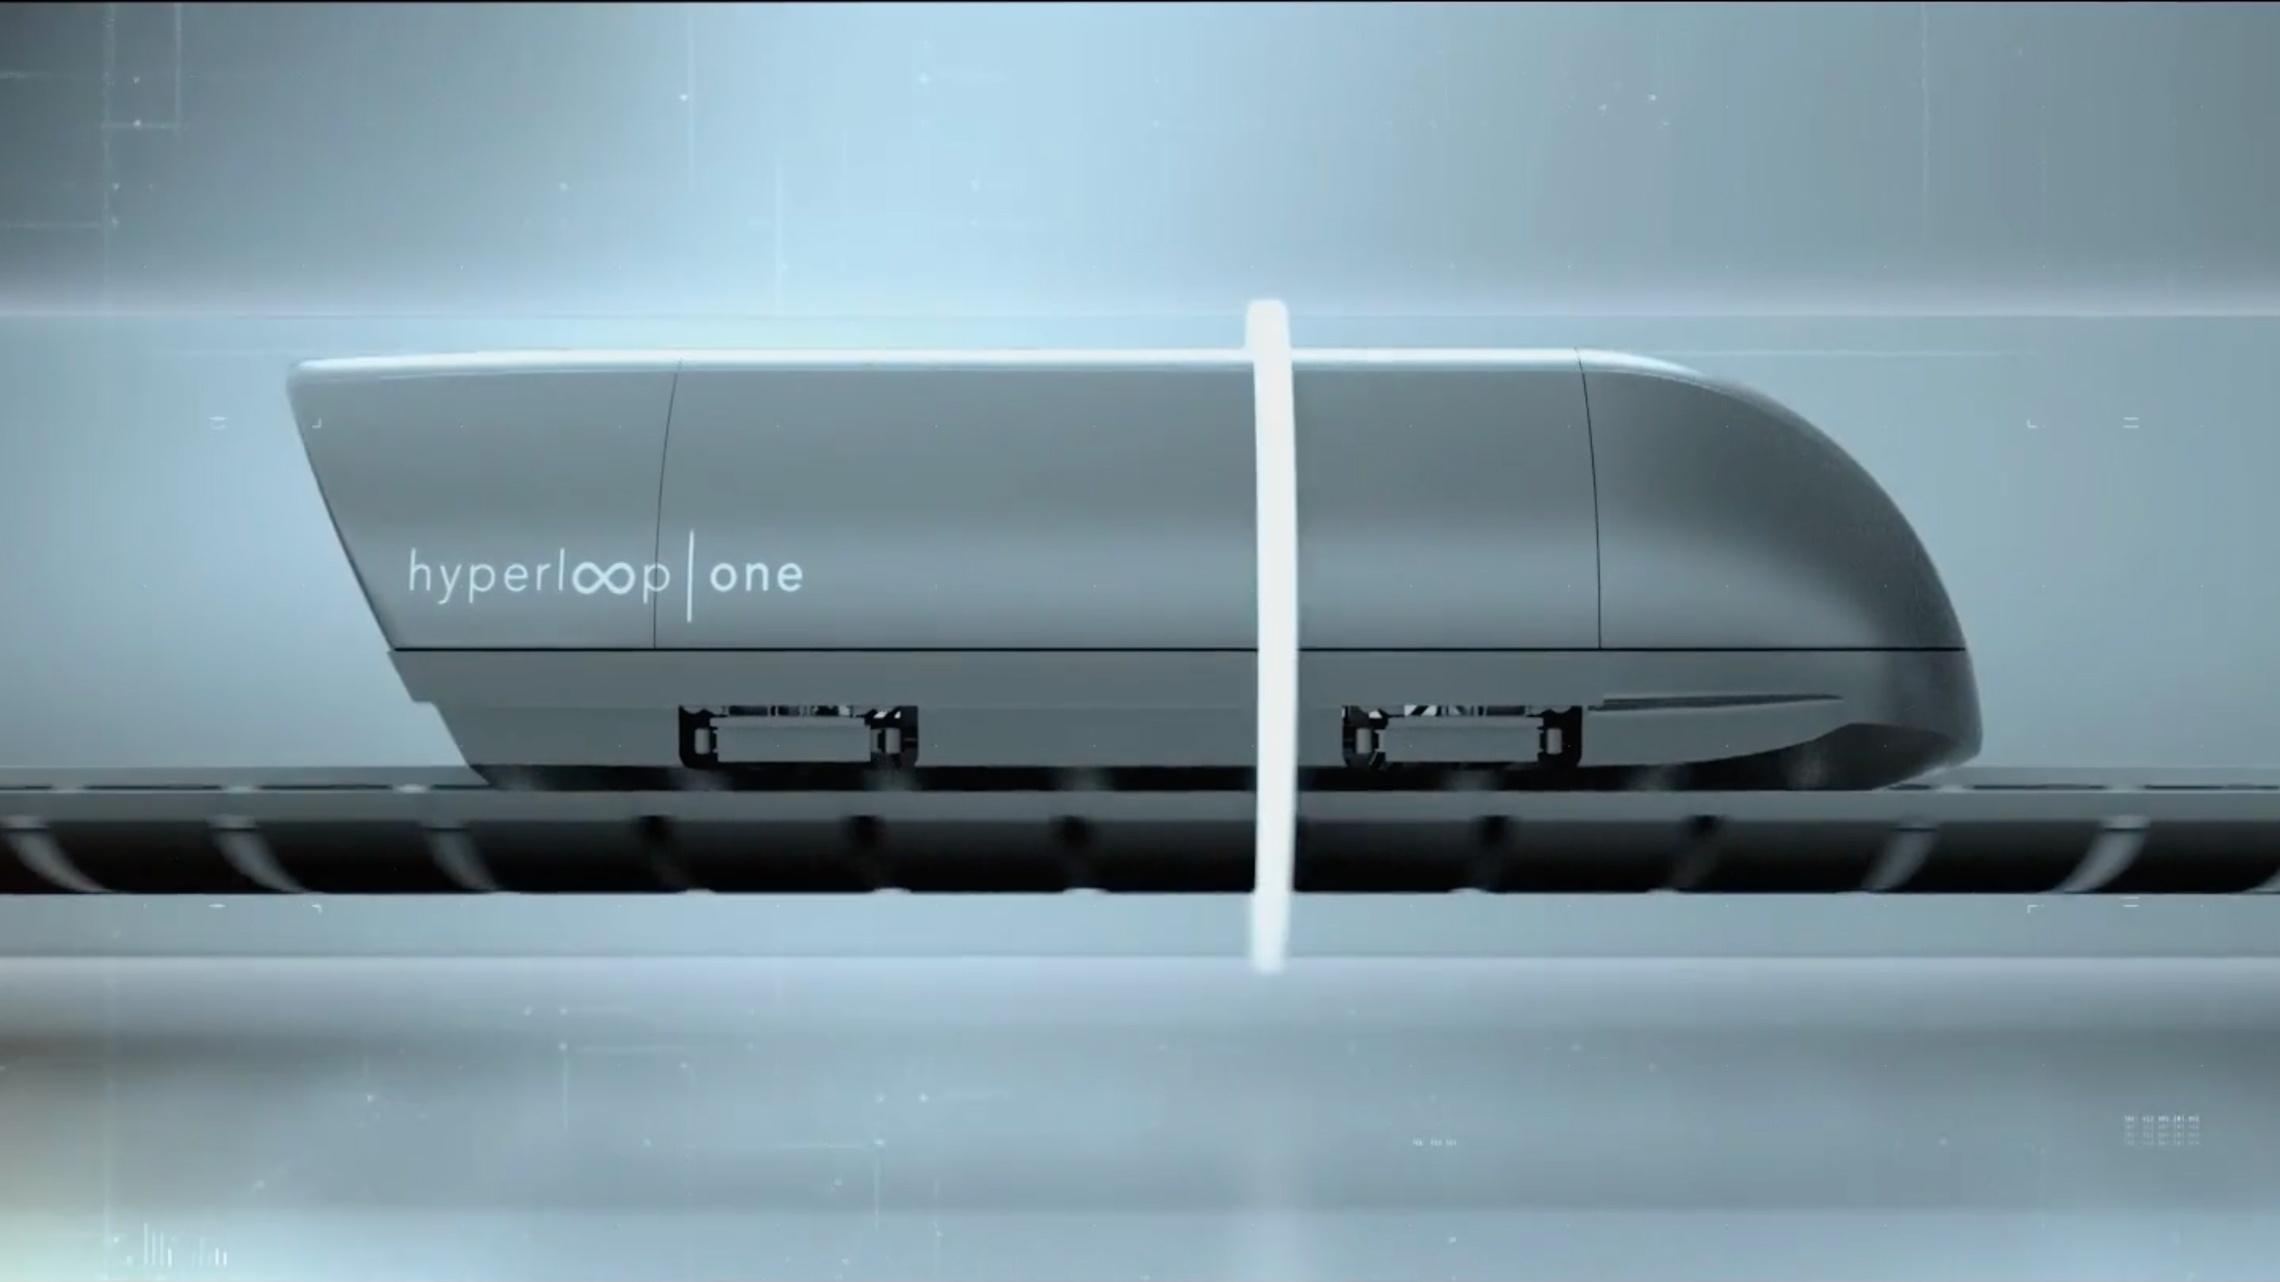 hyperloop-one-ces